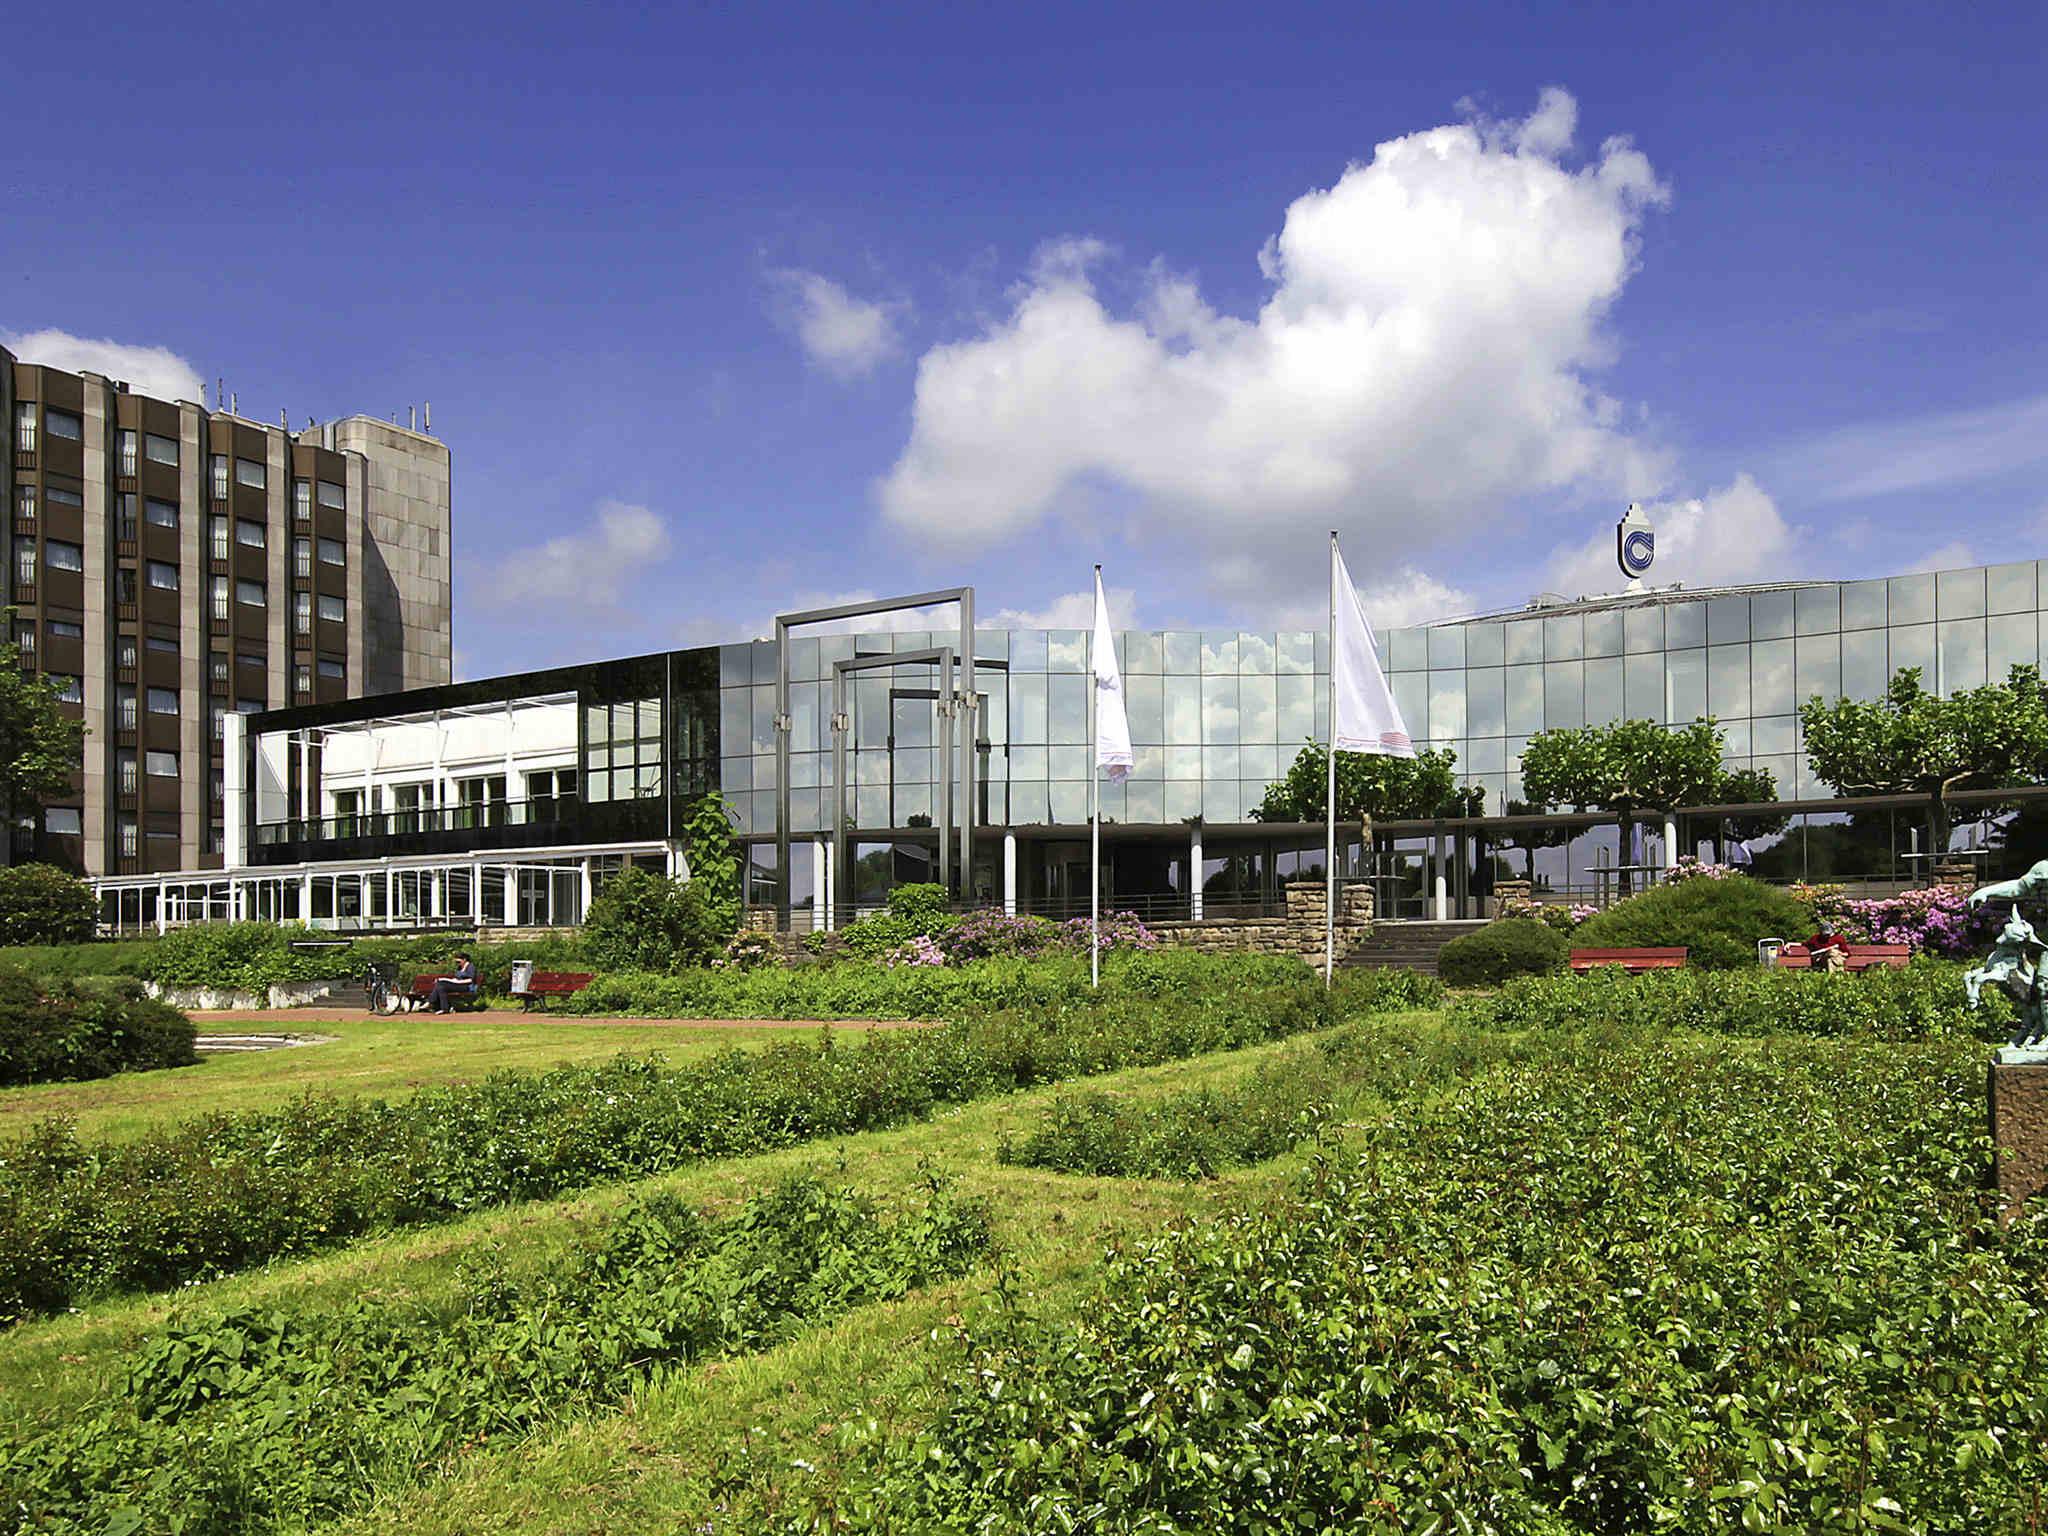 Otel – Mercure Hotel Dortmund Messe & Kongress